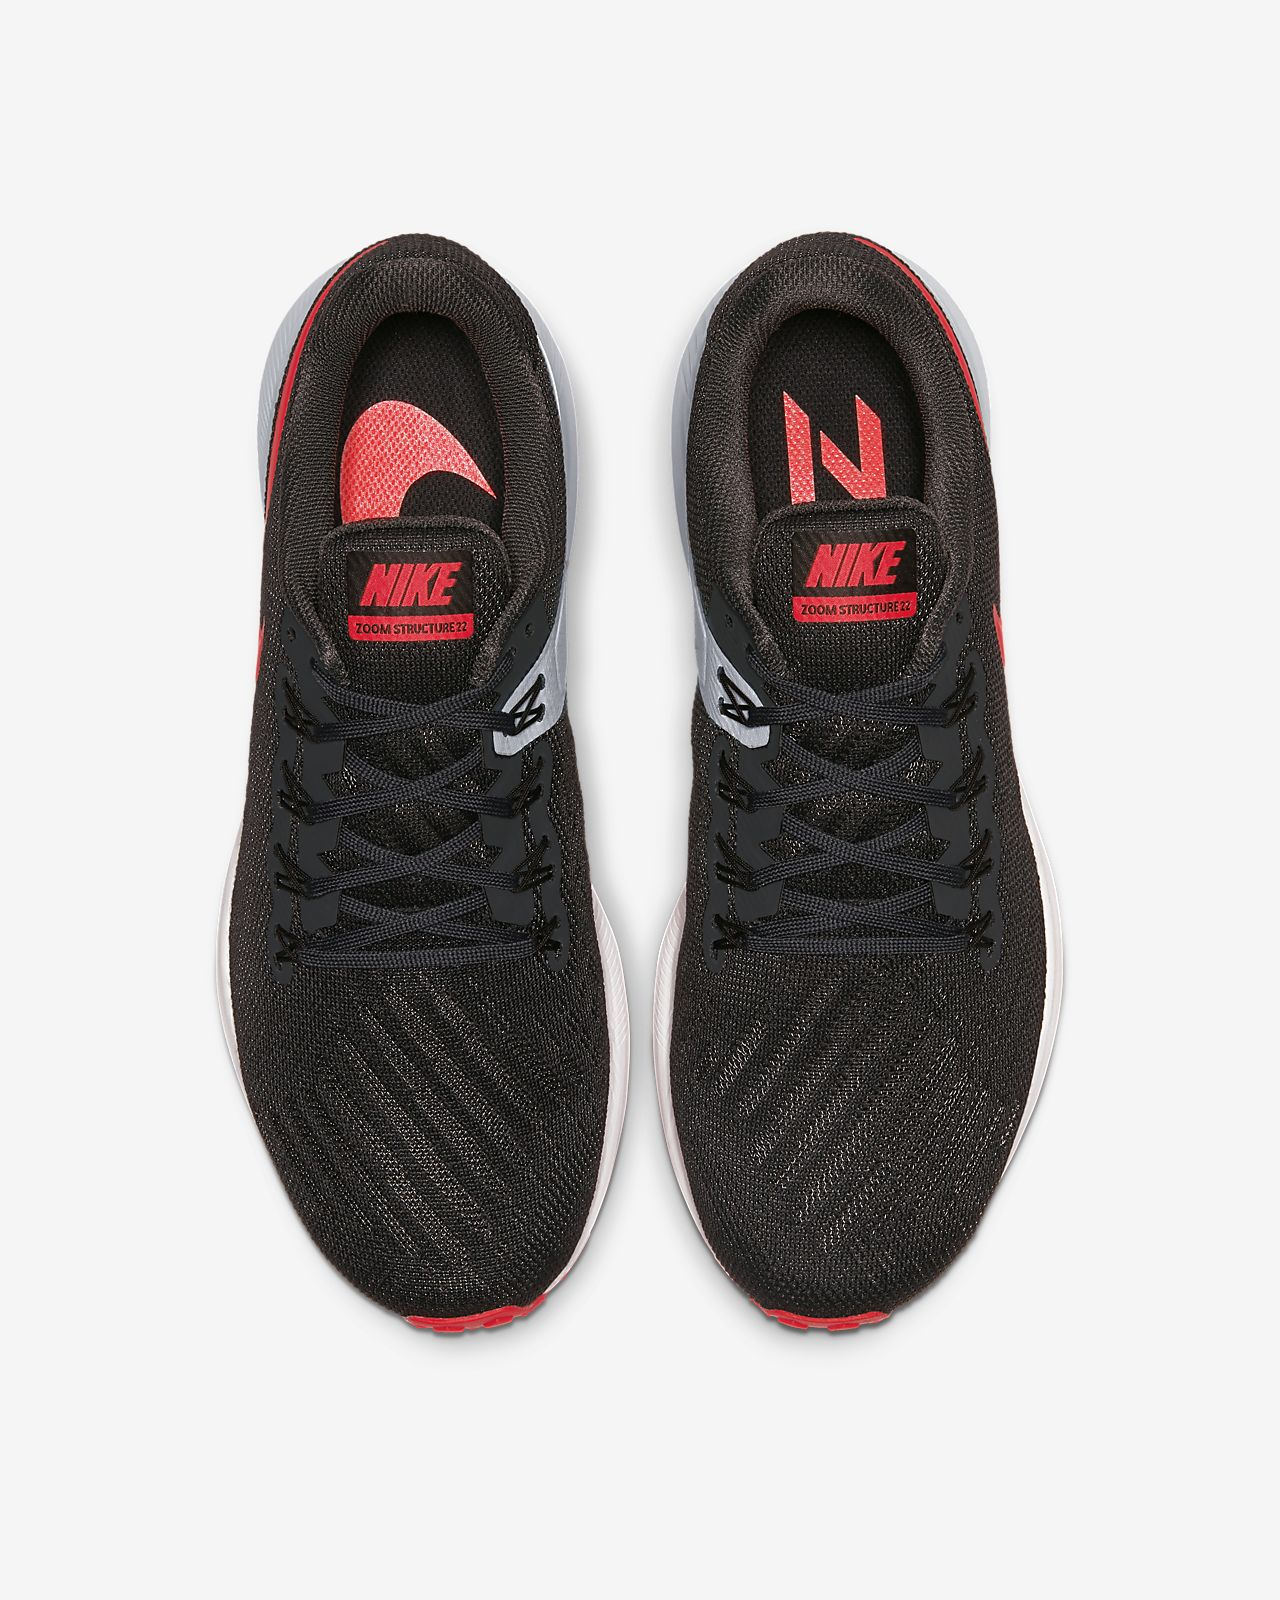 Nike Air Zoom Structure 22 Herren Laufschuh